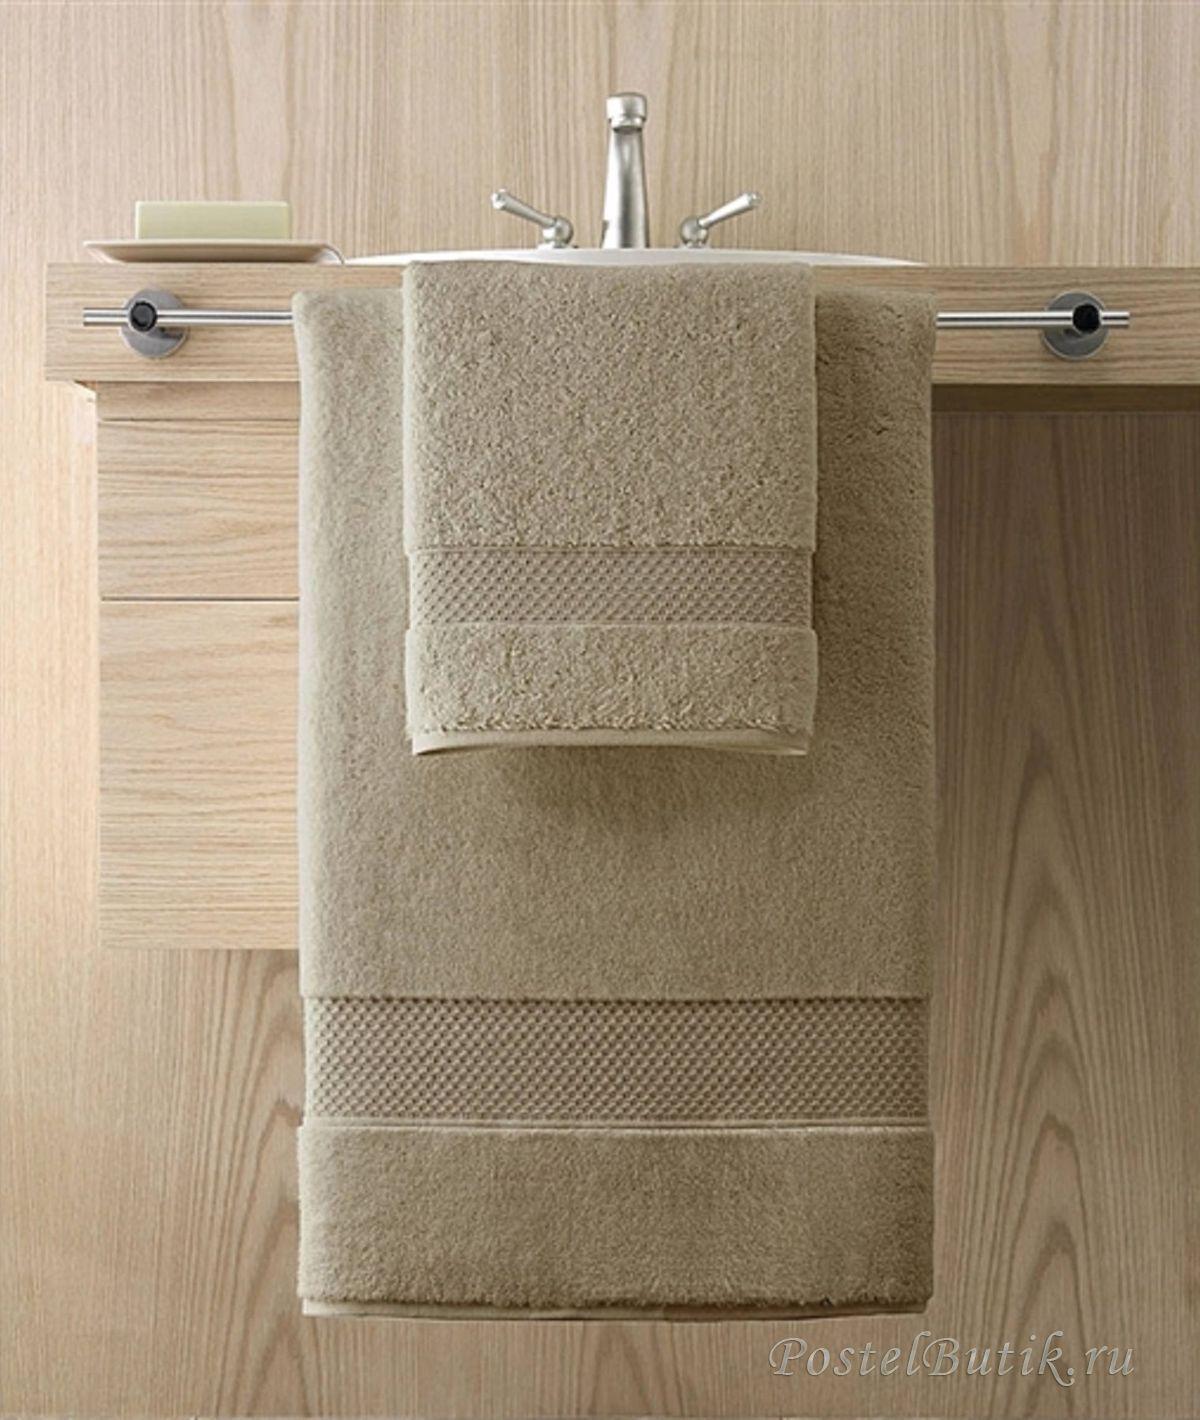 Коврики для ванной Банный коврик 51x86 Kassatex Elegance Desert Sand elitnoe-polotentse-mahrovoe-elegance-desert-sand-ot-kassatex-portugaliya.jpg